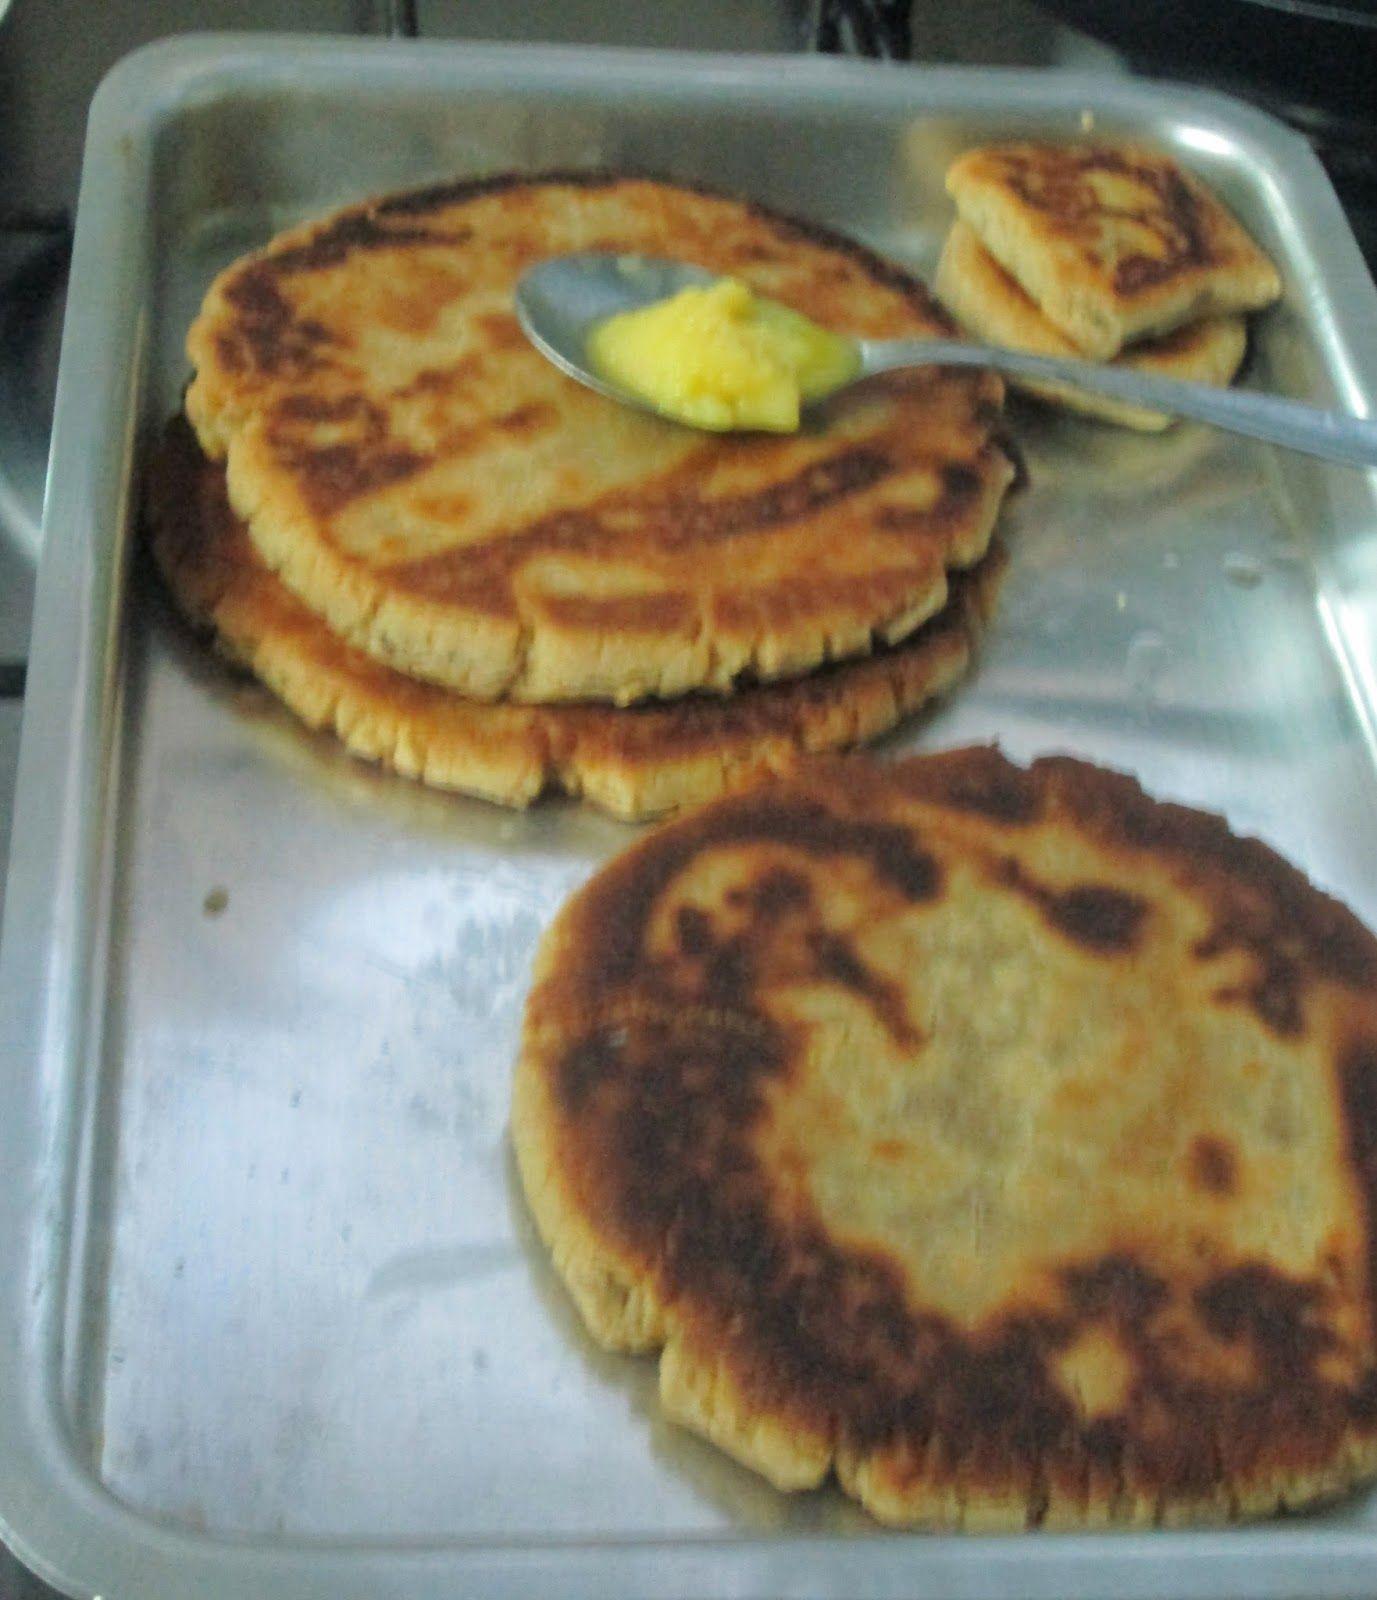 Lolo S Cakes Sweets: Sindhi Food Mazaa: MITHO LOLO / MITHI LOLI ( Sindhi Sweet